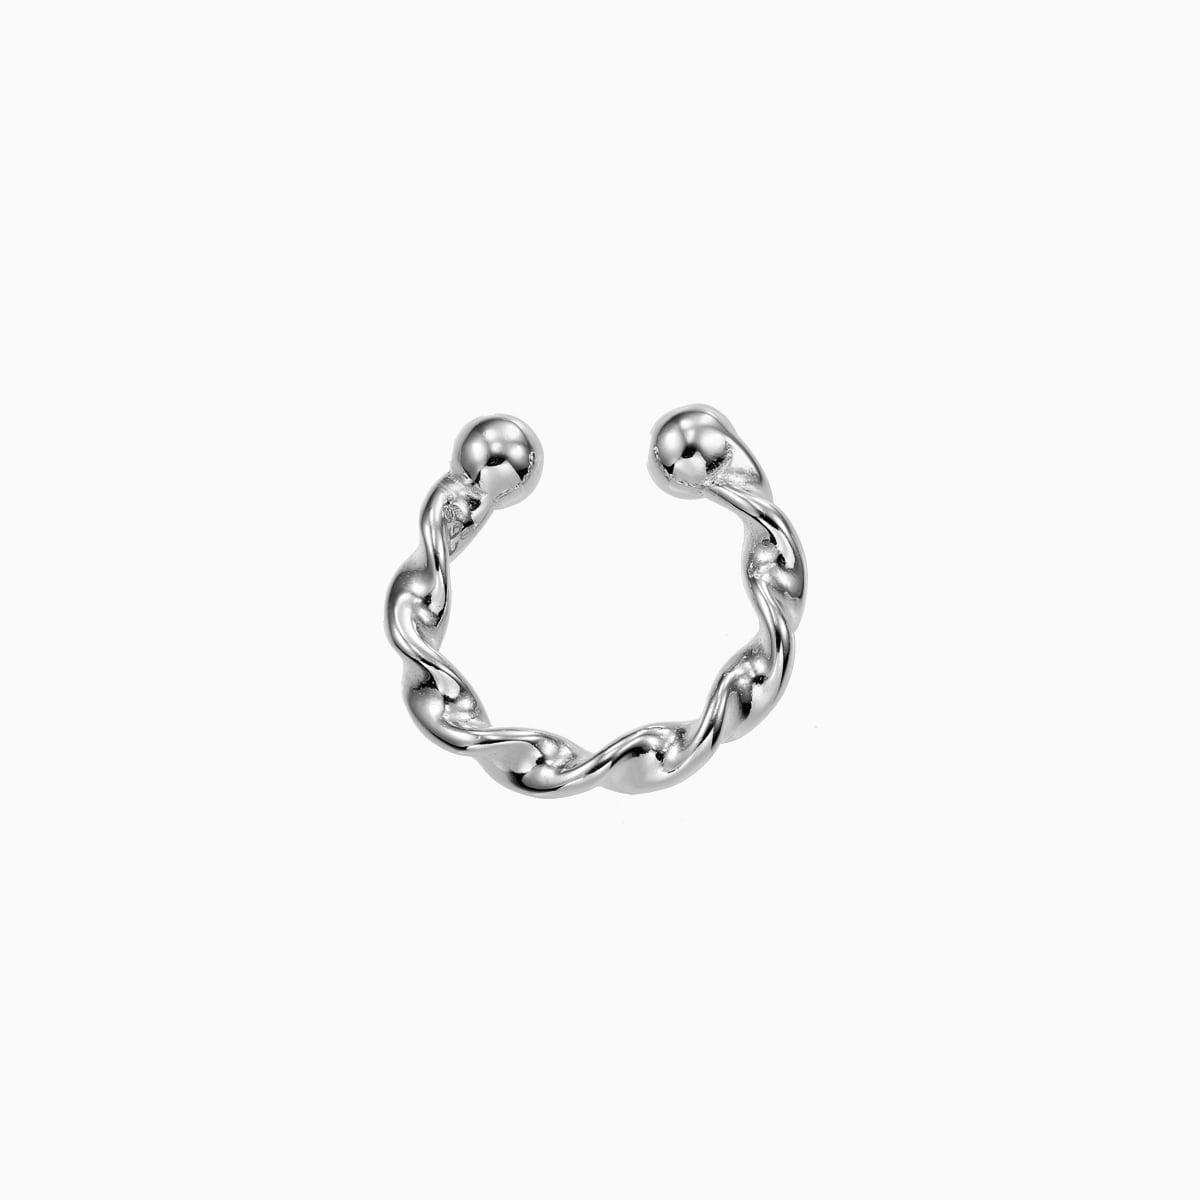 Cercel din argint Manissi Twist Cuff